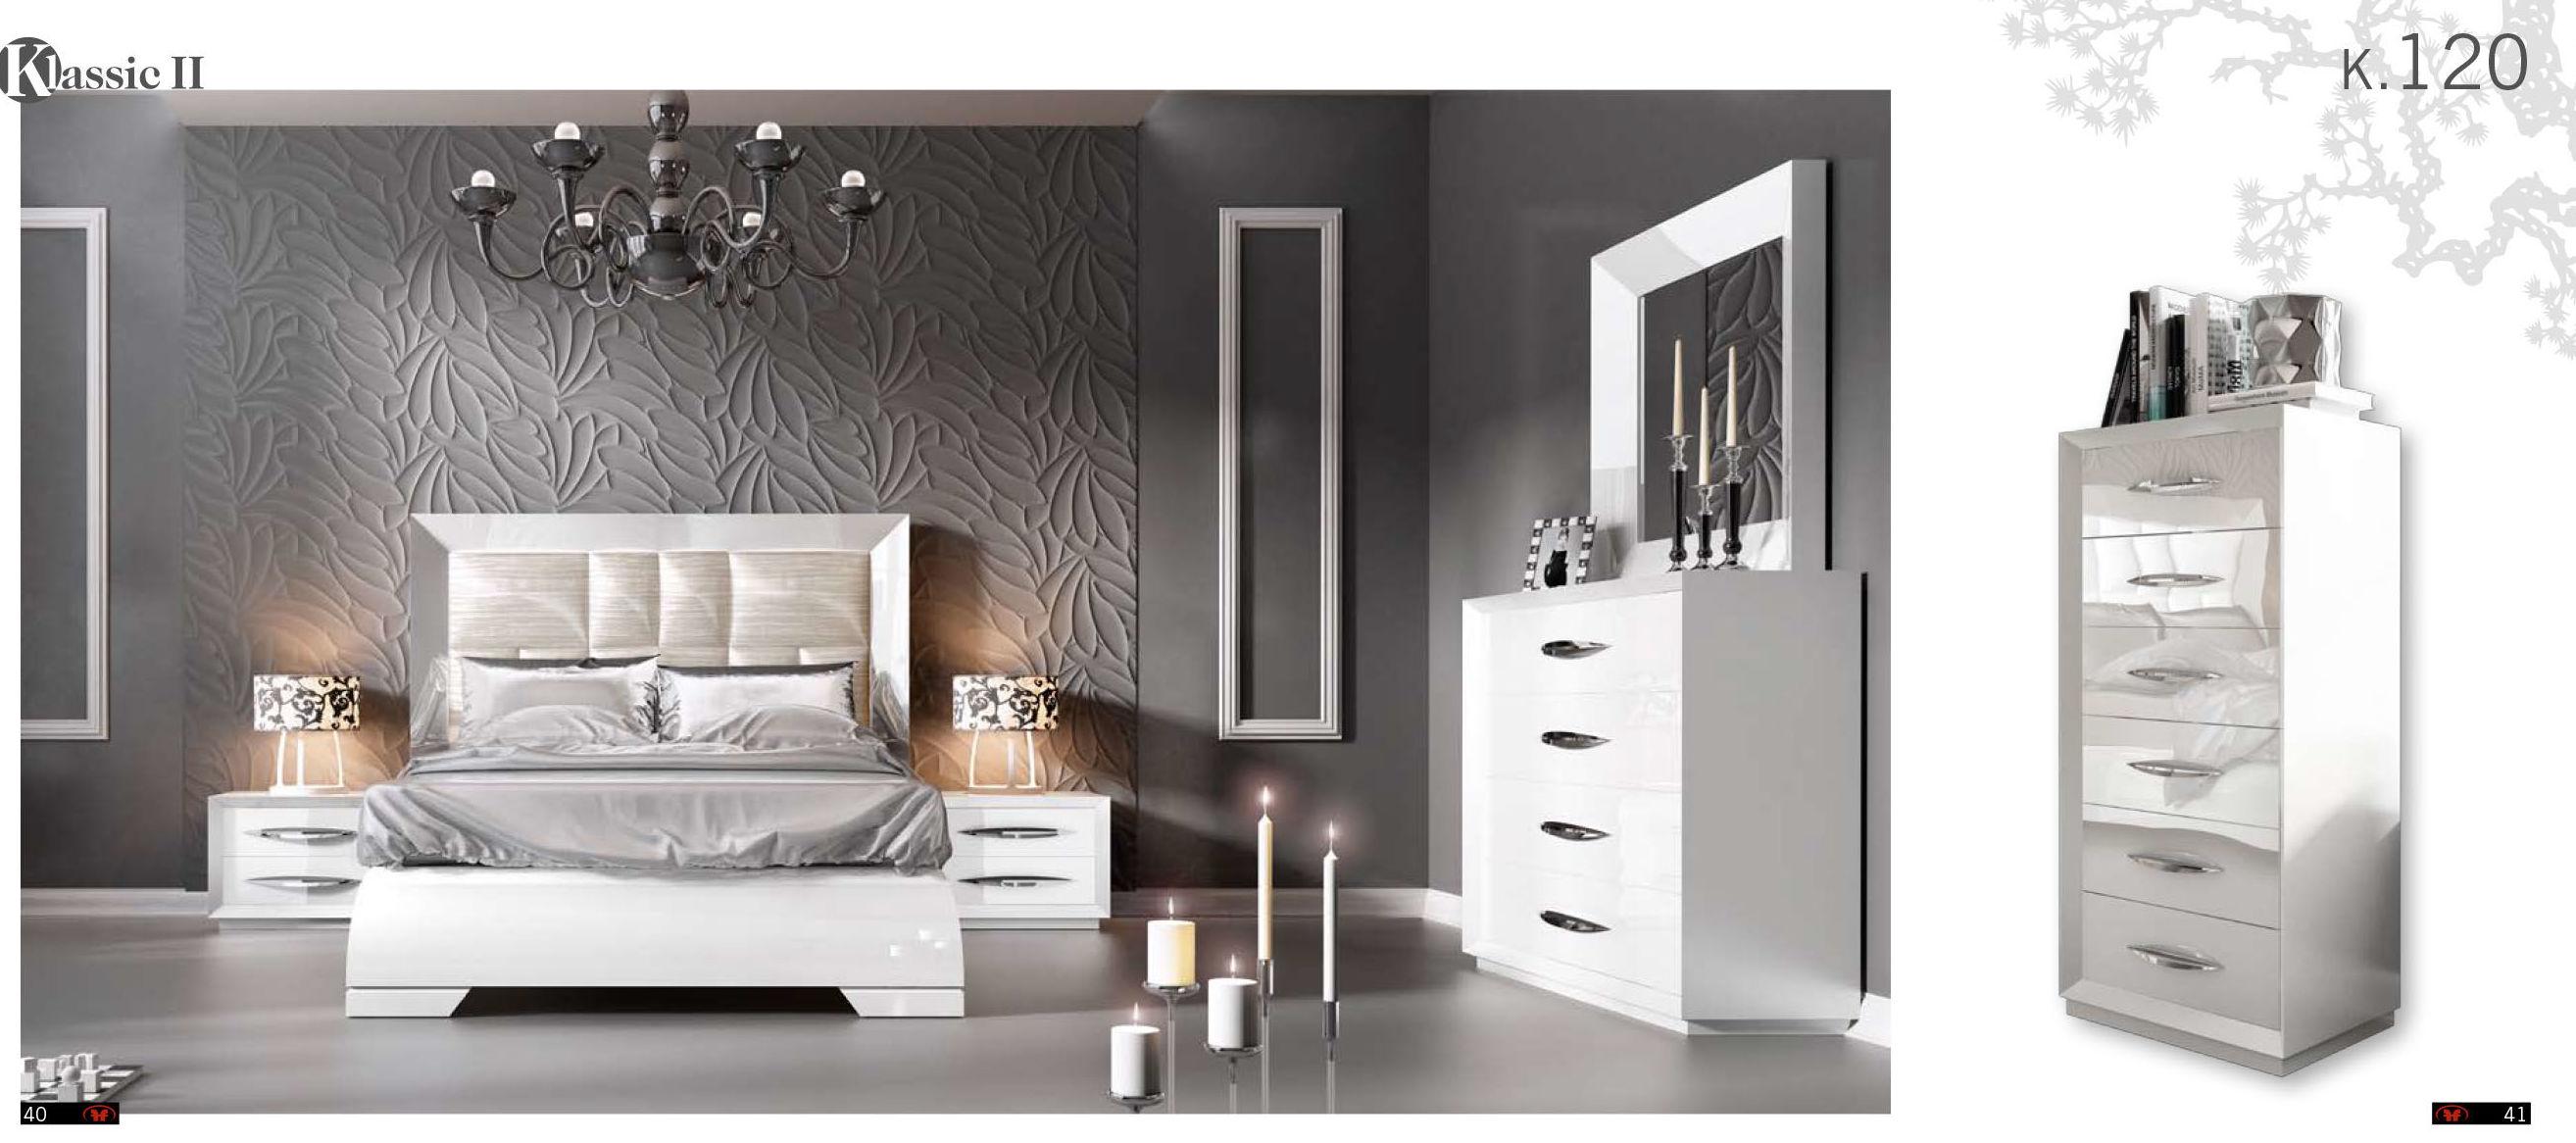 Franco furniture colecci n klassic 2 cat logo de muebles for Muebles franco